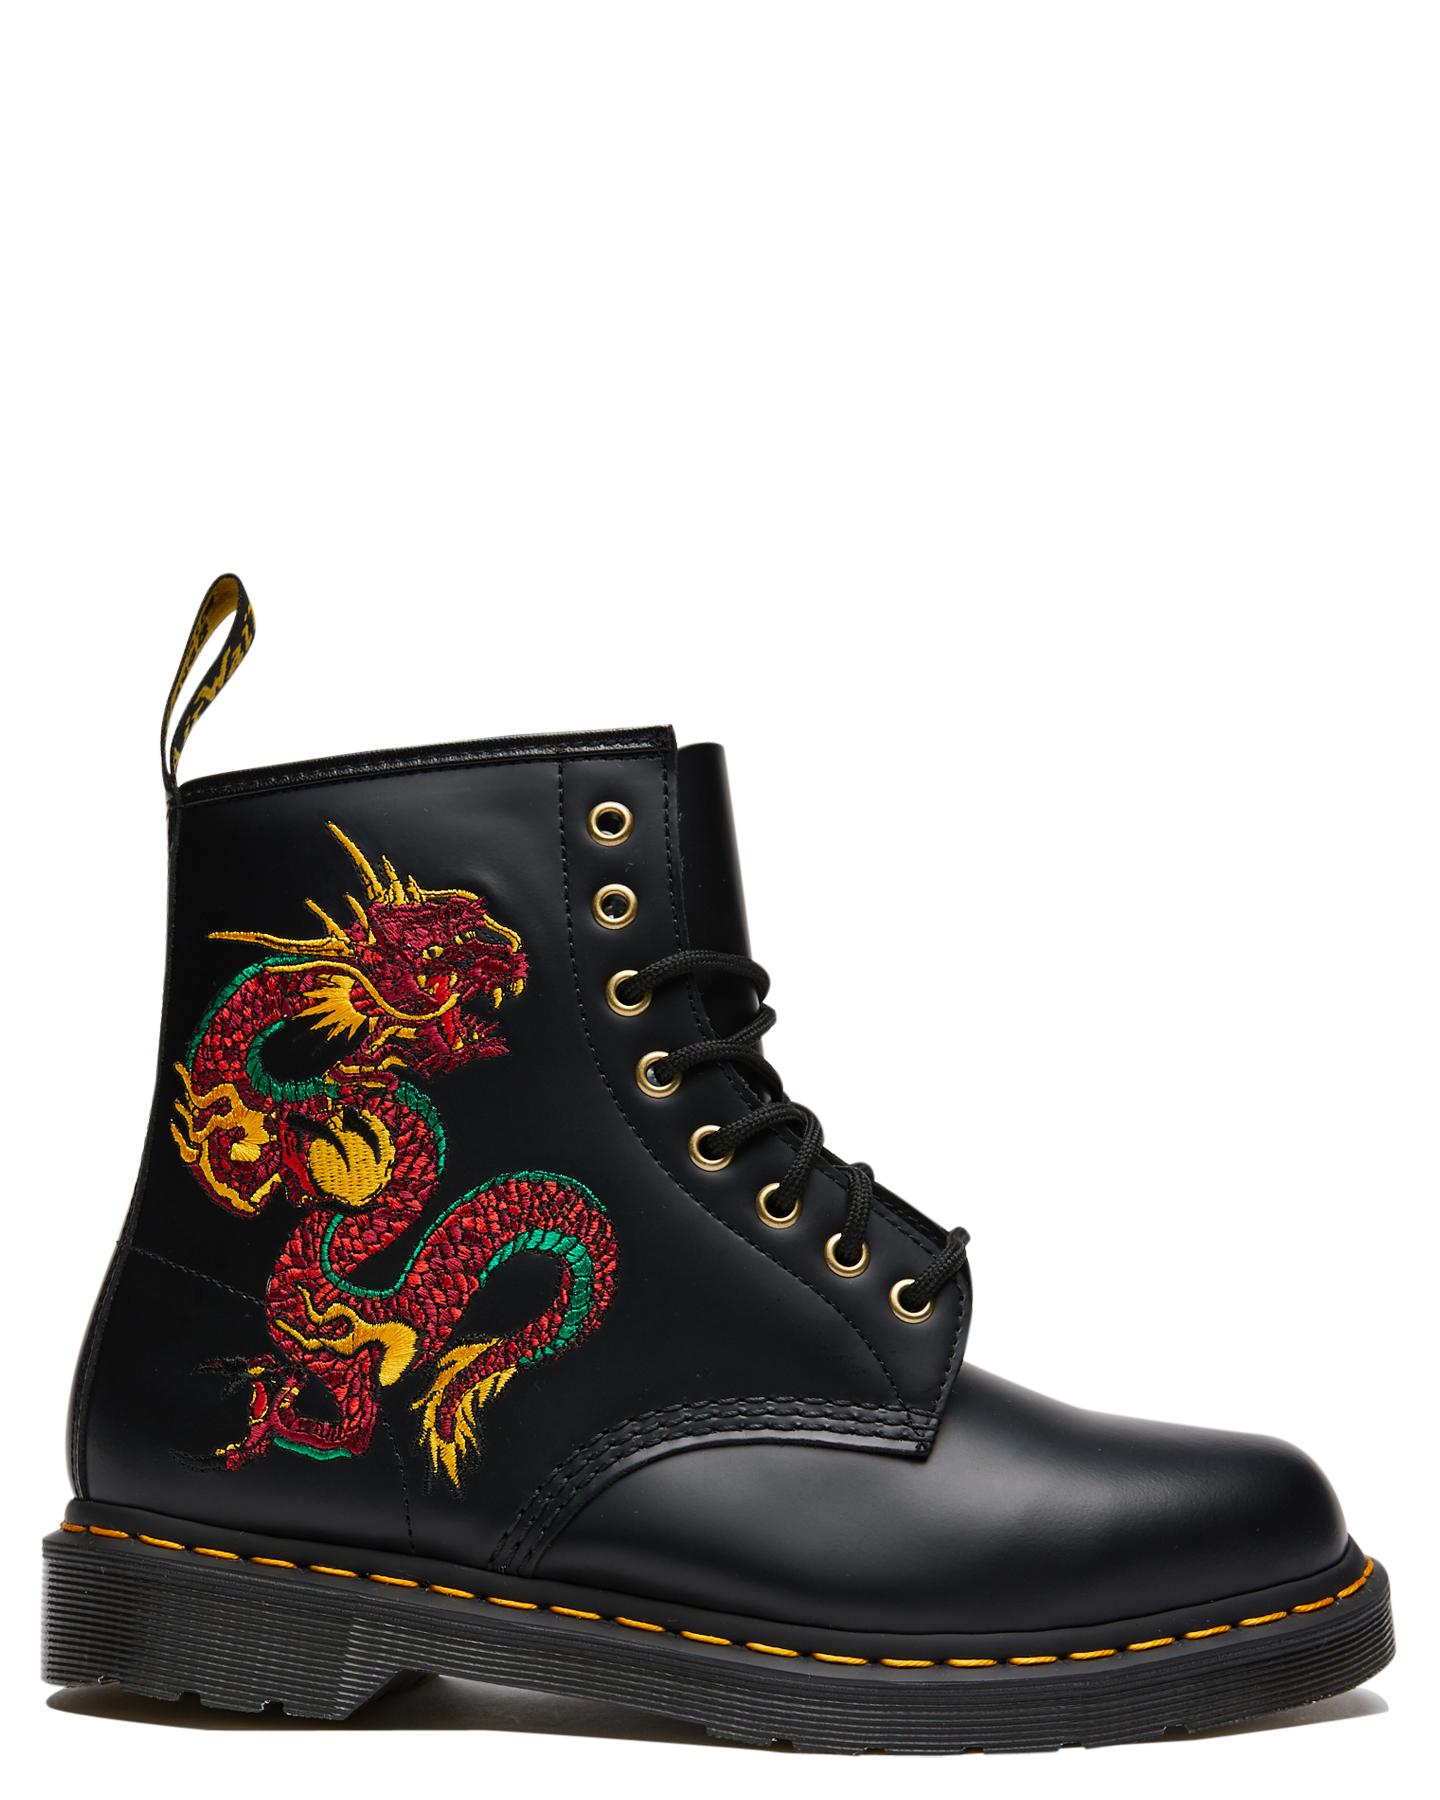 girls dm style boots \u003e Clearance shop